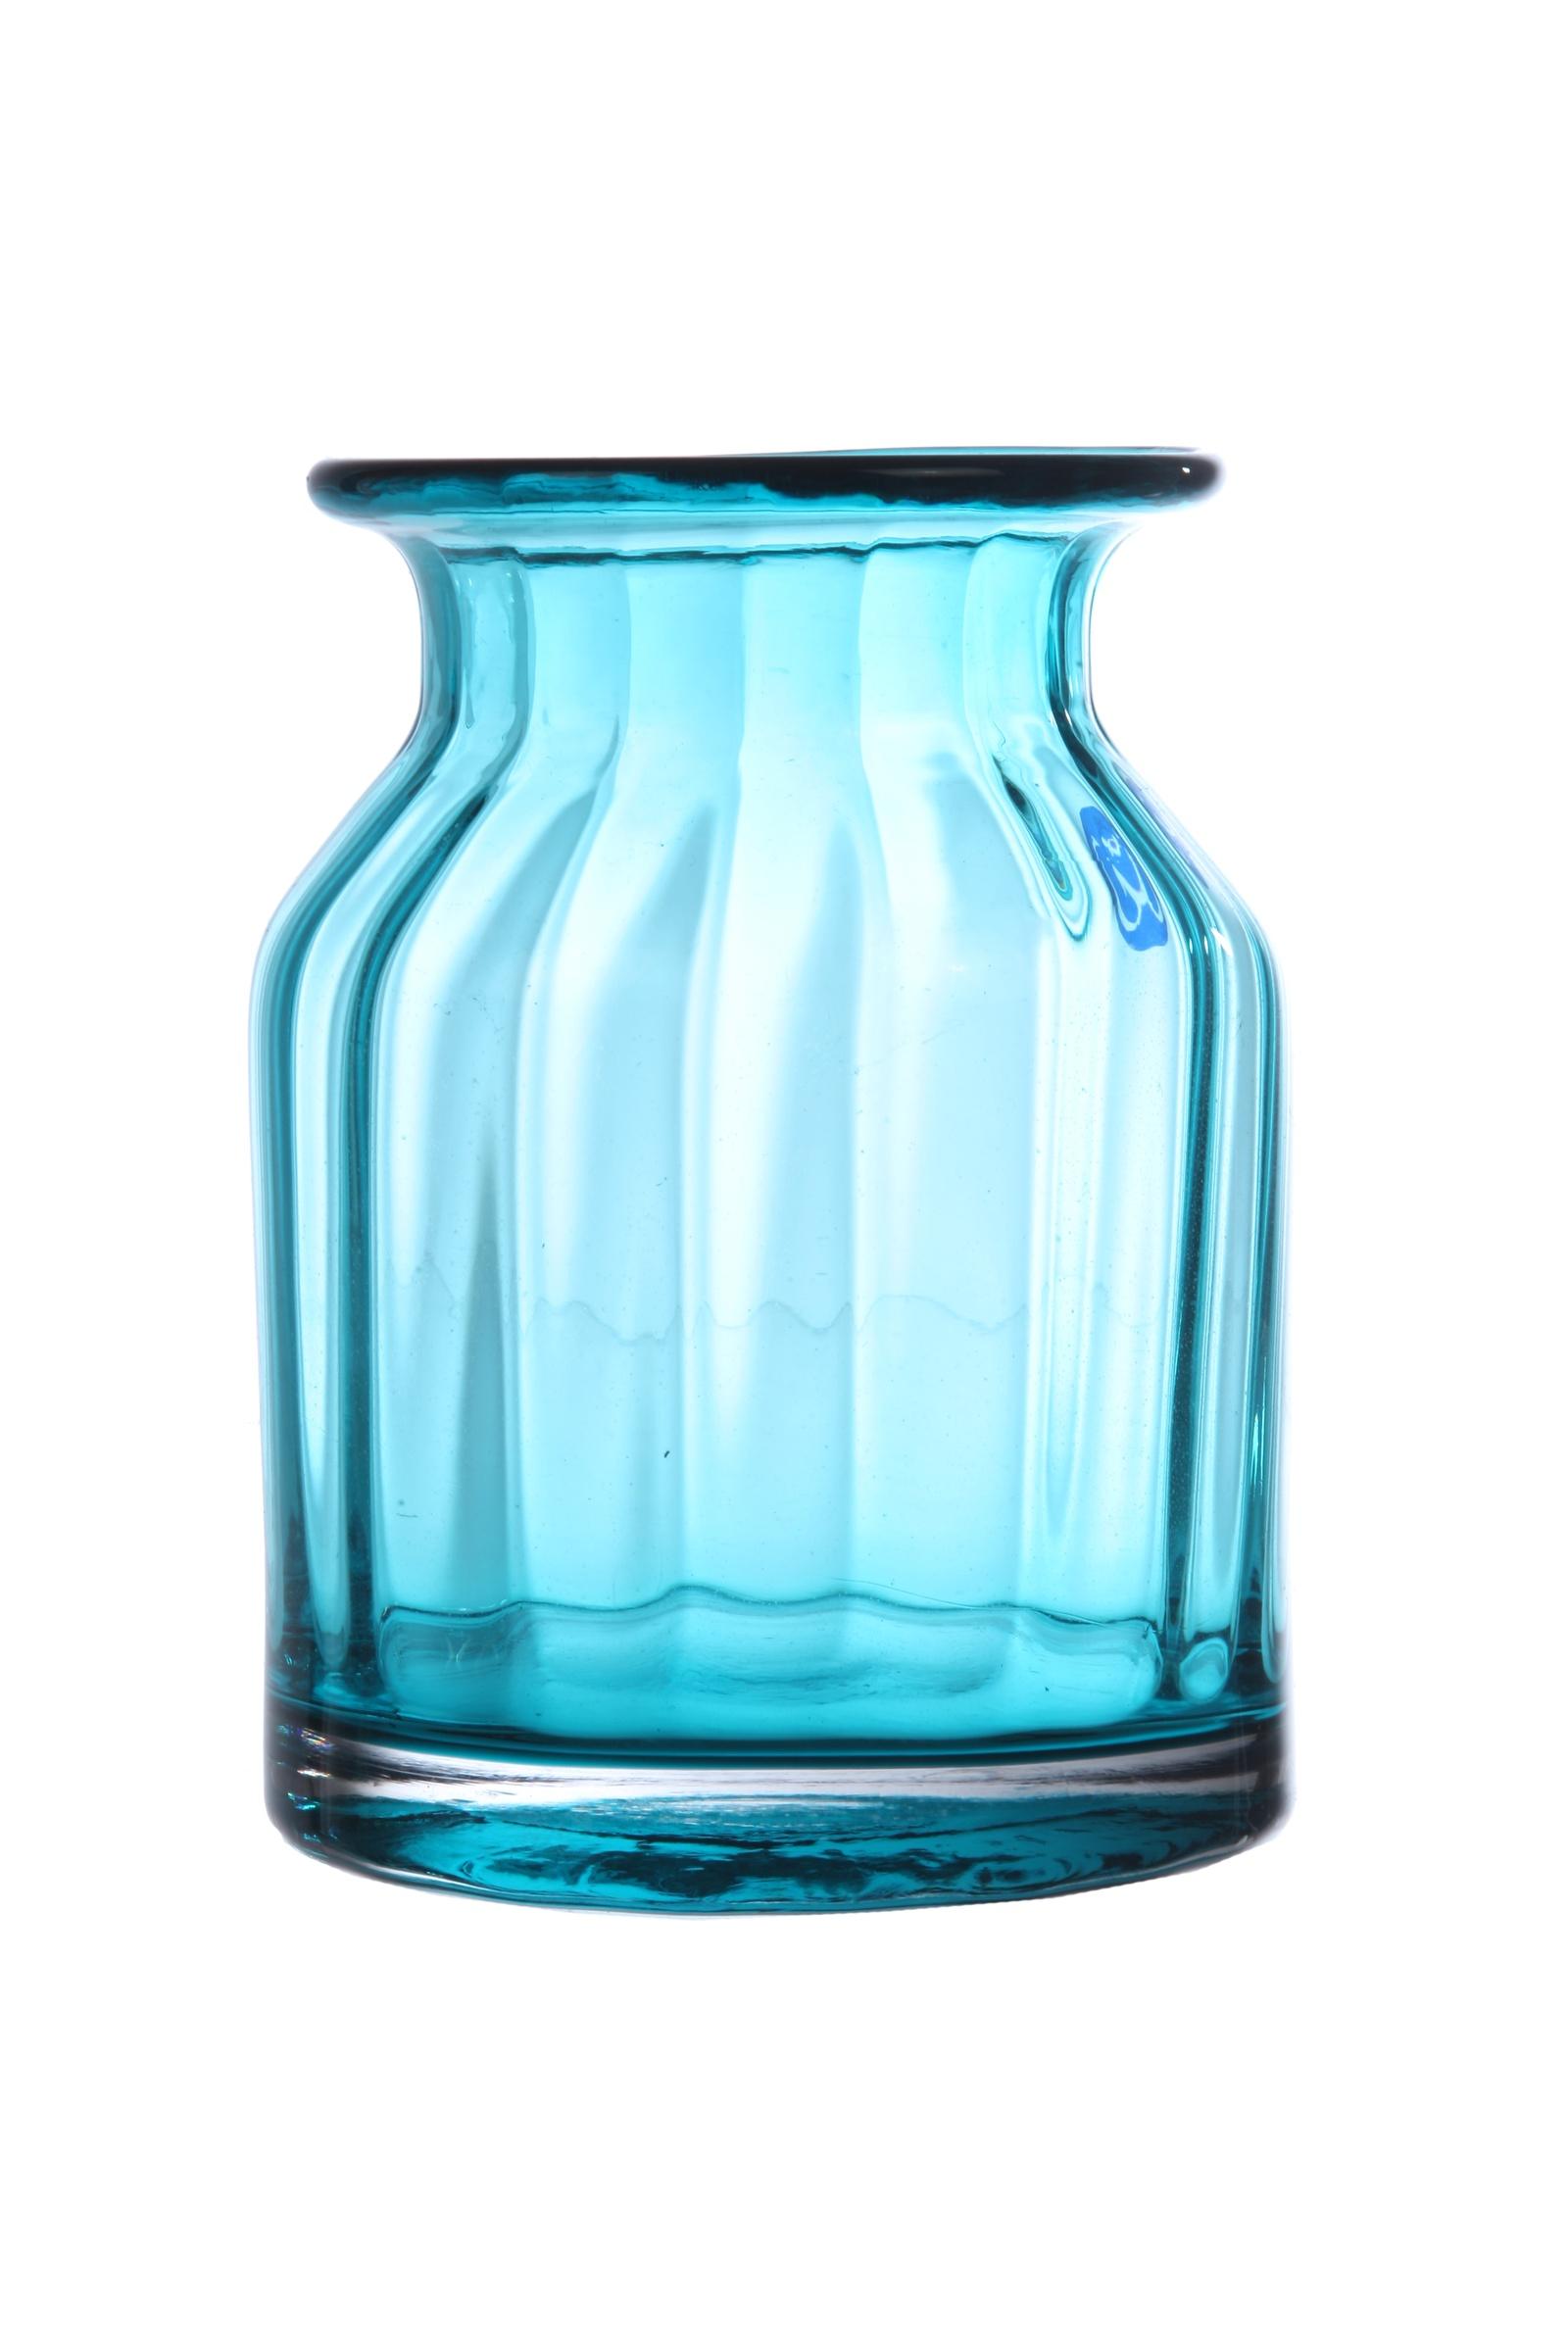 Ваза IsmatDecor Стеклянная ваза, ST-4 голубой, голубой